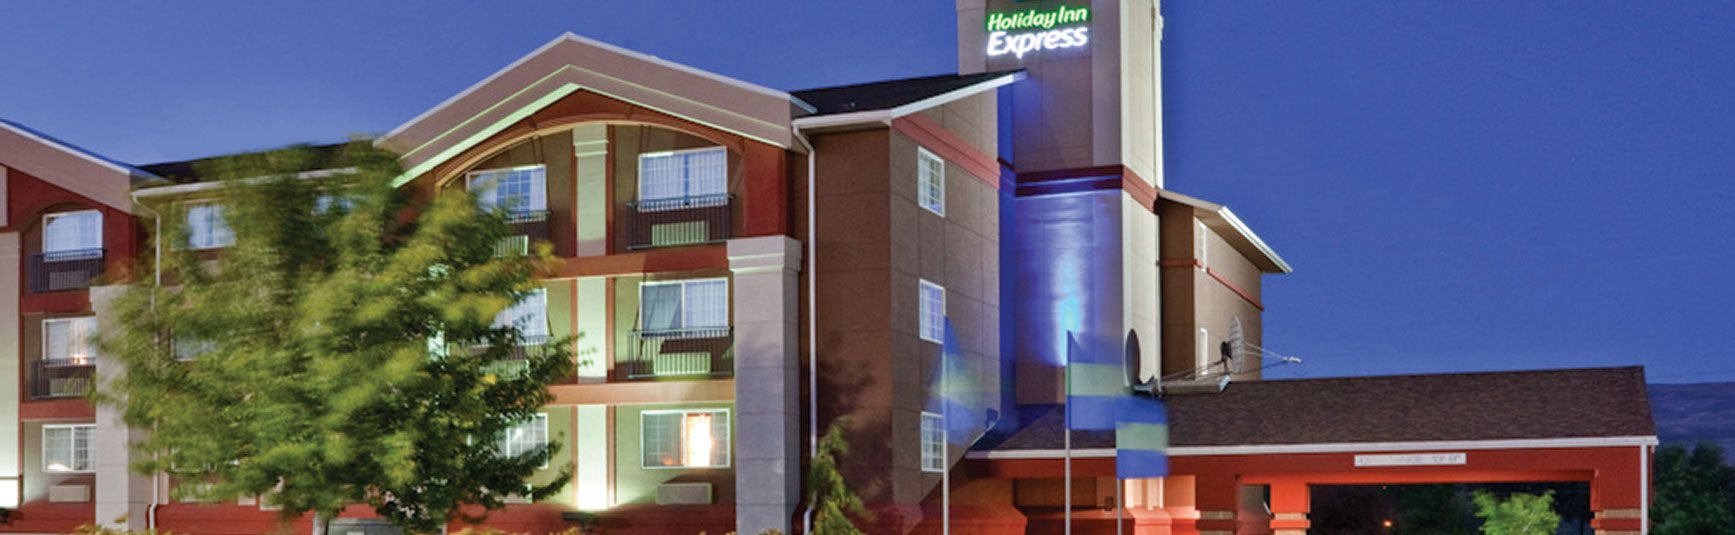 Holiday Inn Express – Wenatchee